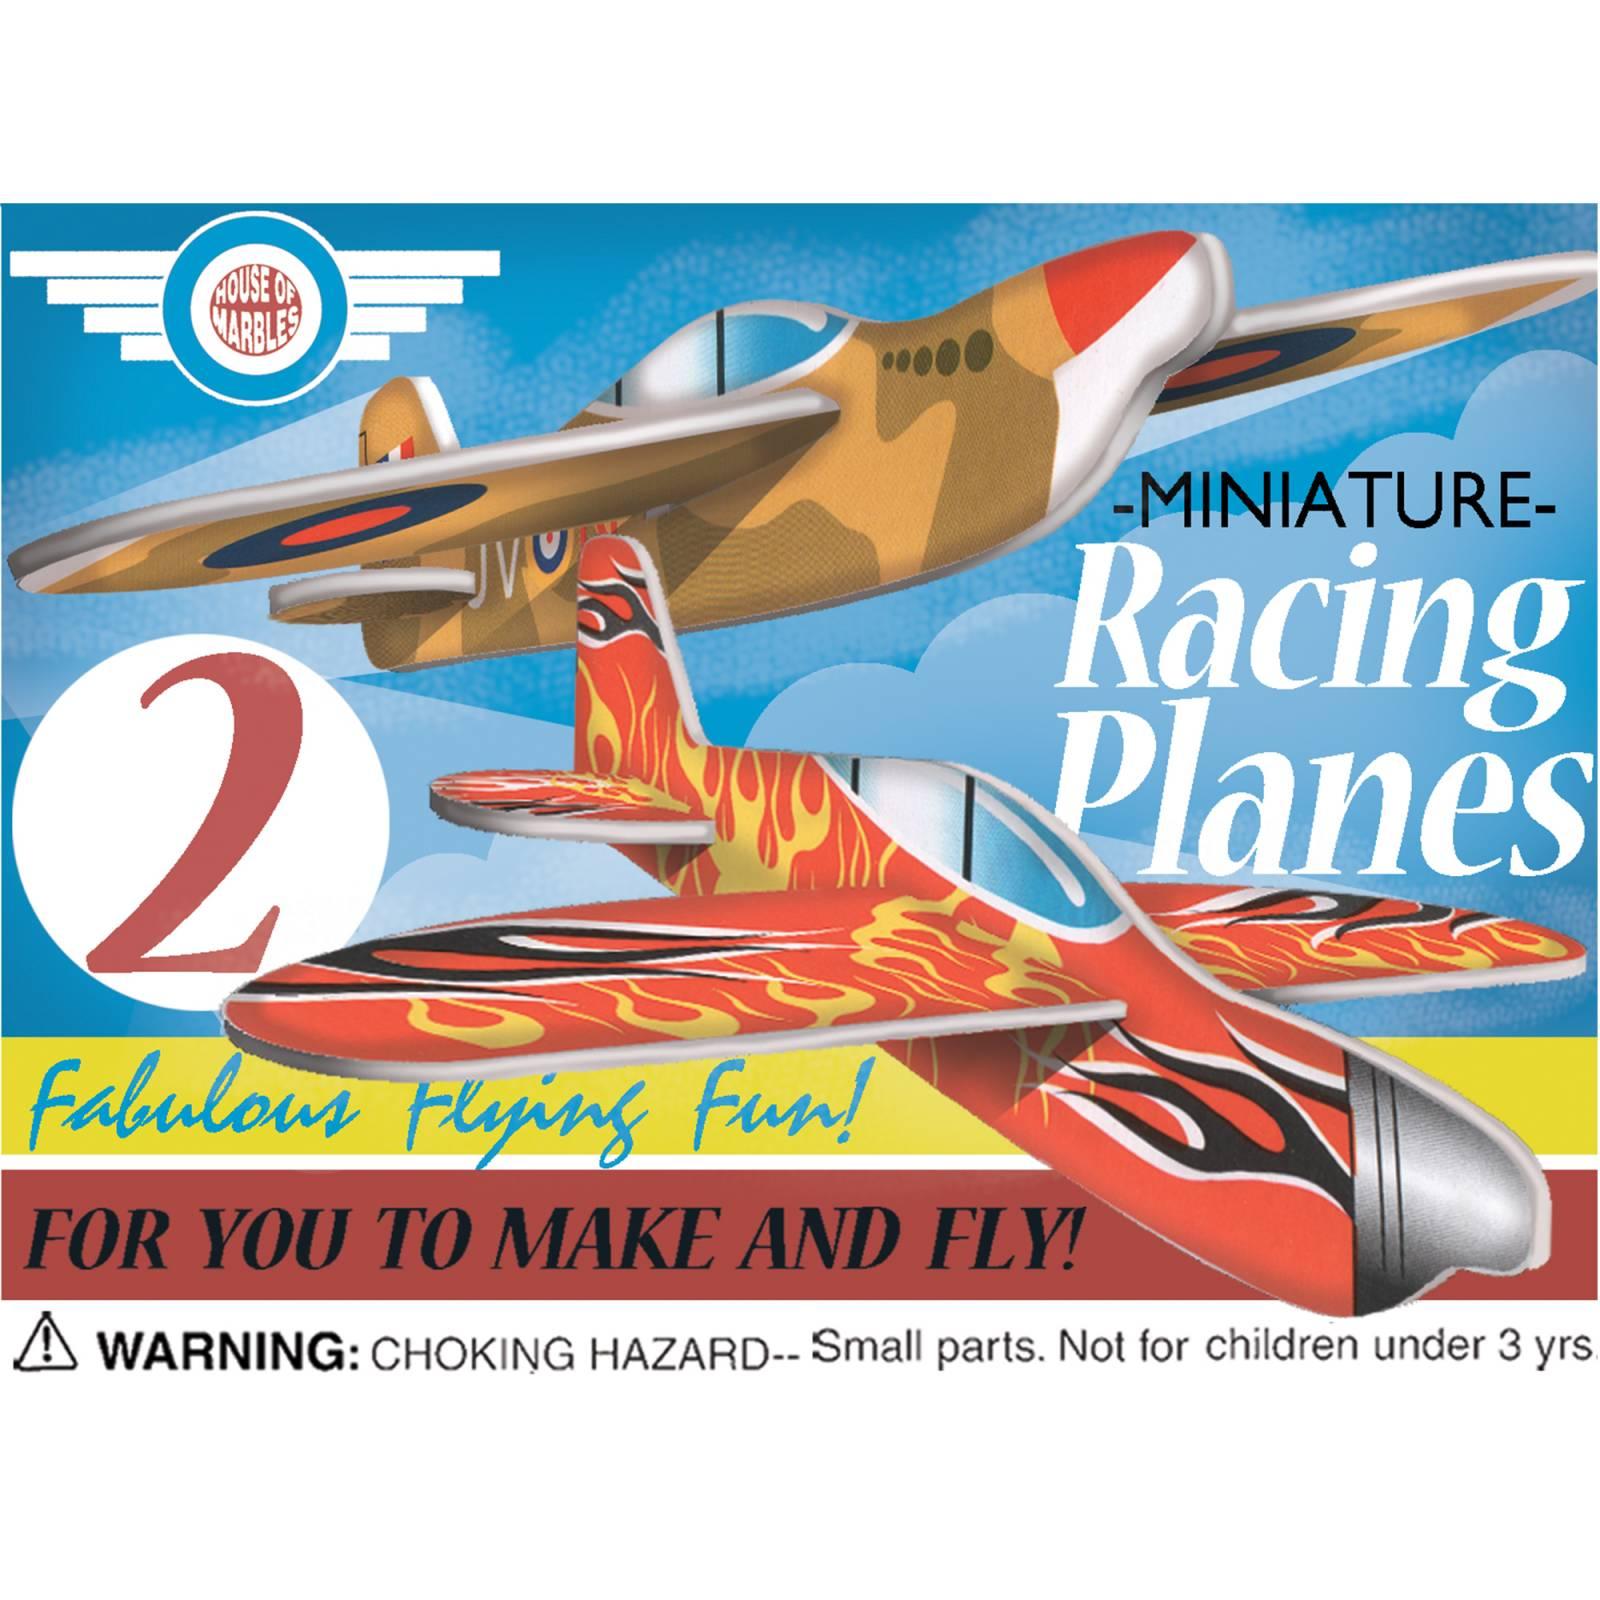 Racing Planes To Make and Fly